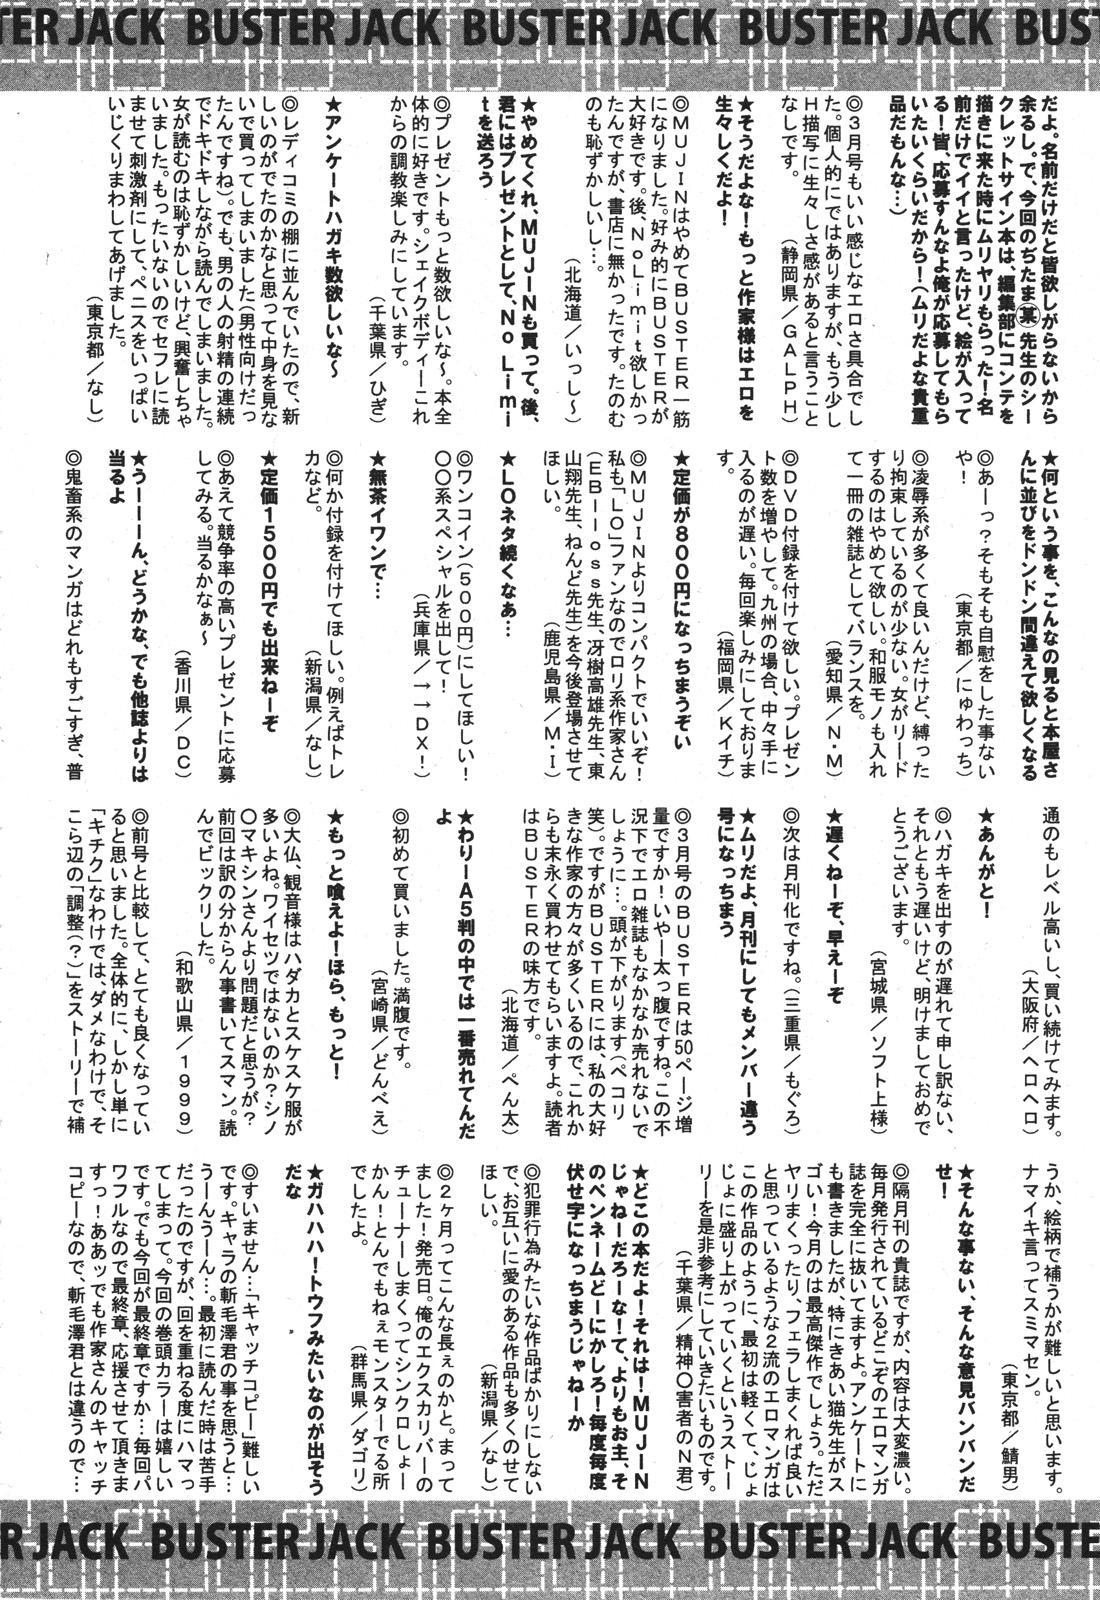 BUSTER COMIC 2010-05 Vol.07 478